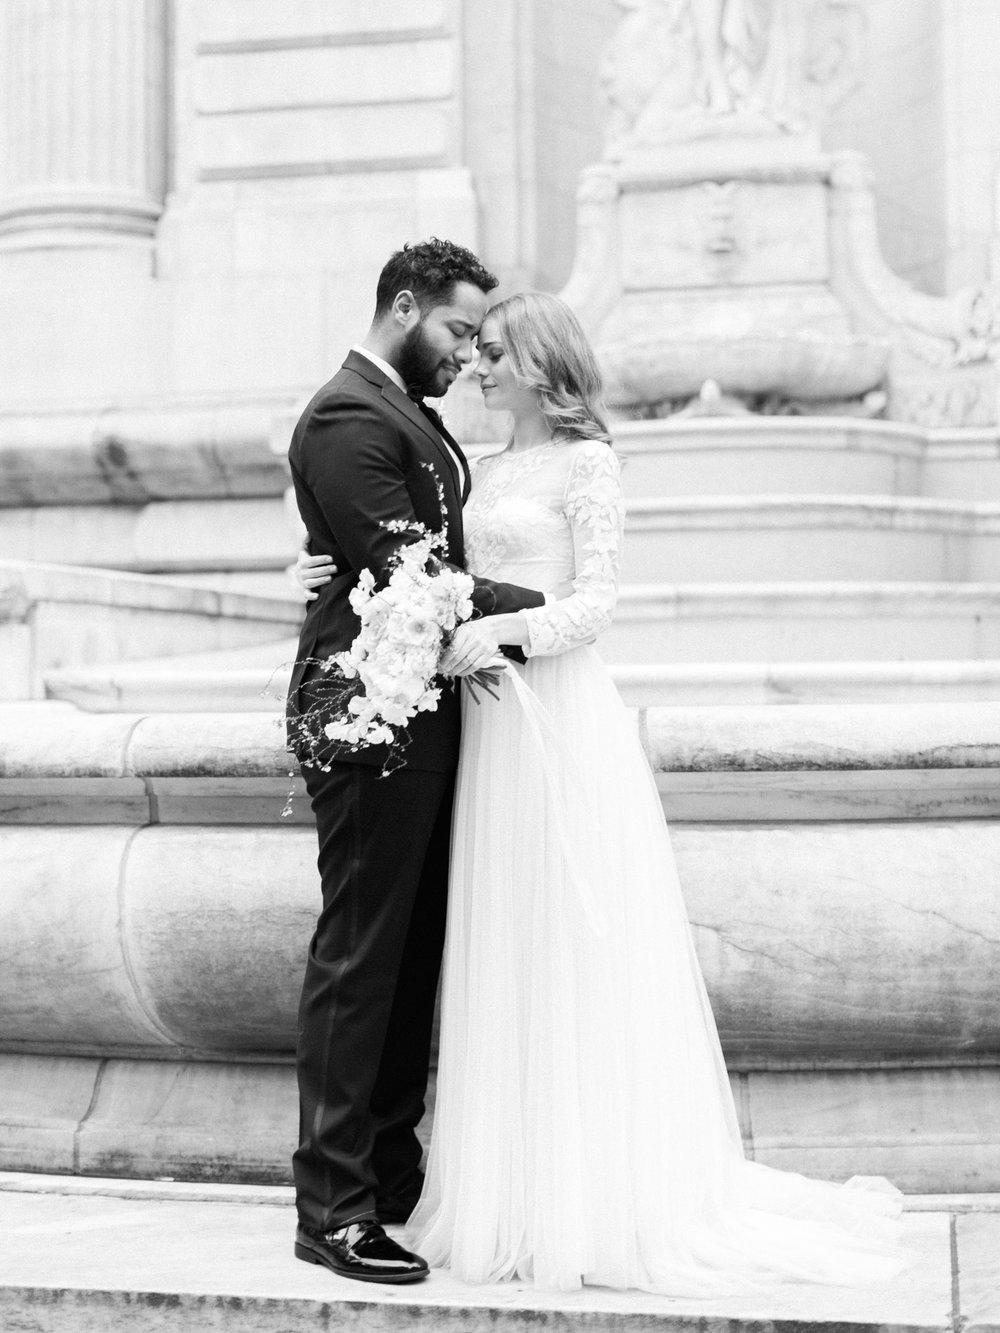 asher-gardner-photography-bryant-park-wedding-00199.jpg